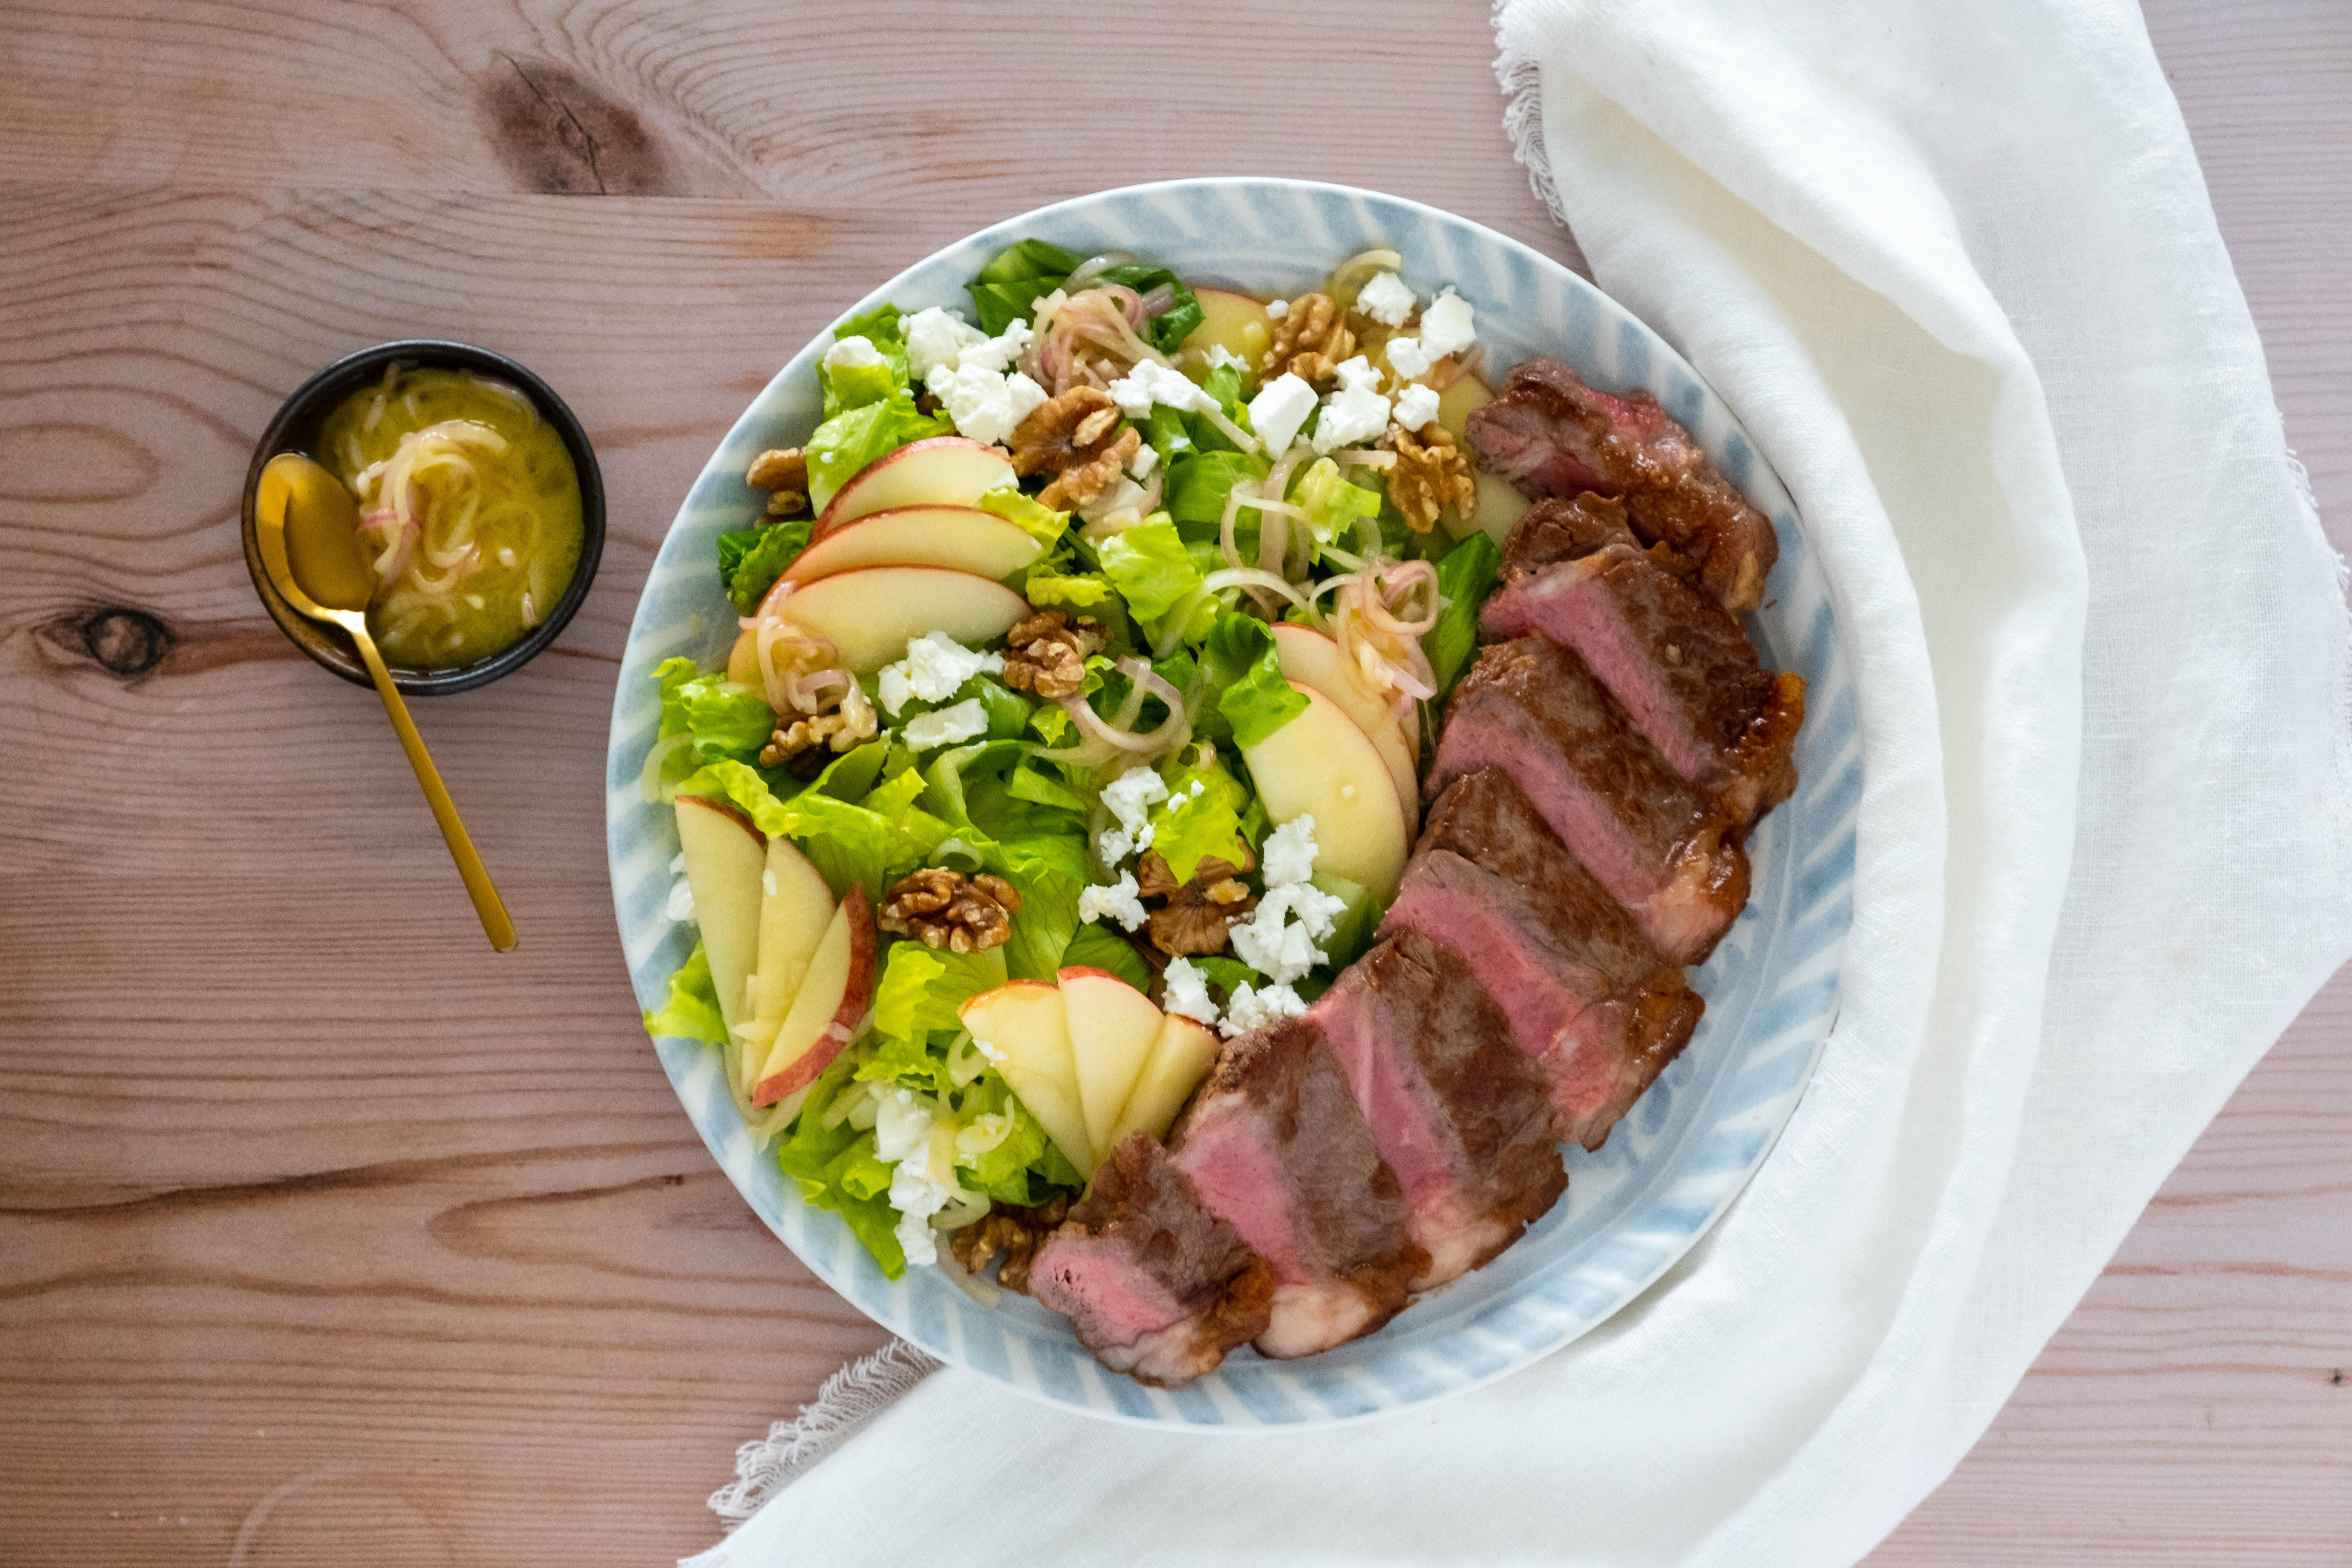 Sirloin Steak with Apple, Walnut and Feta Salad